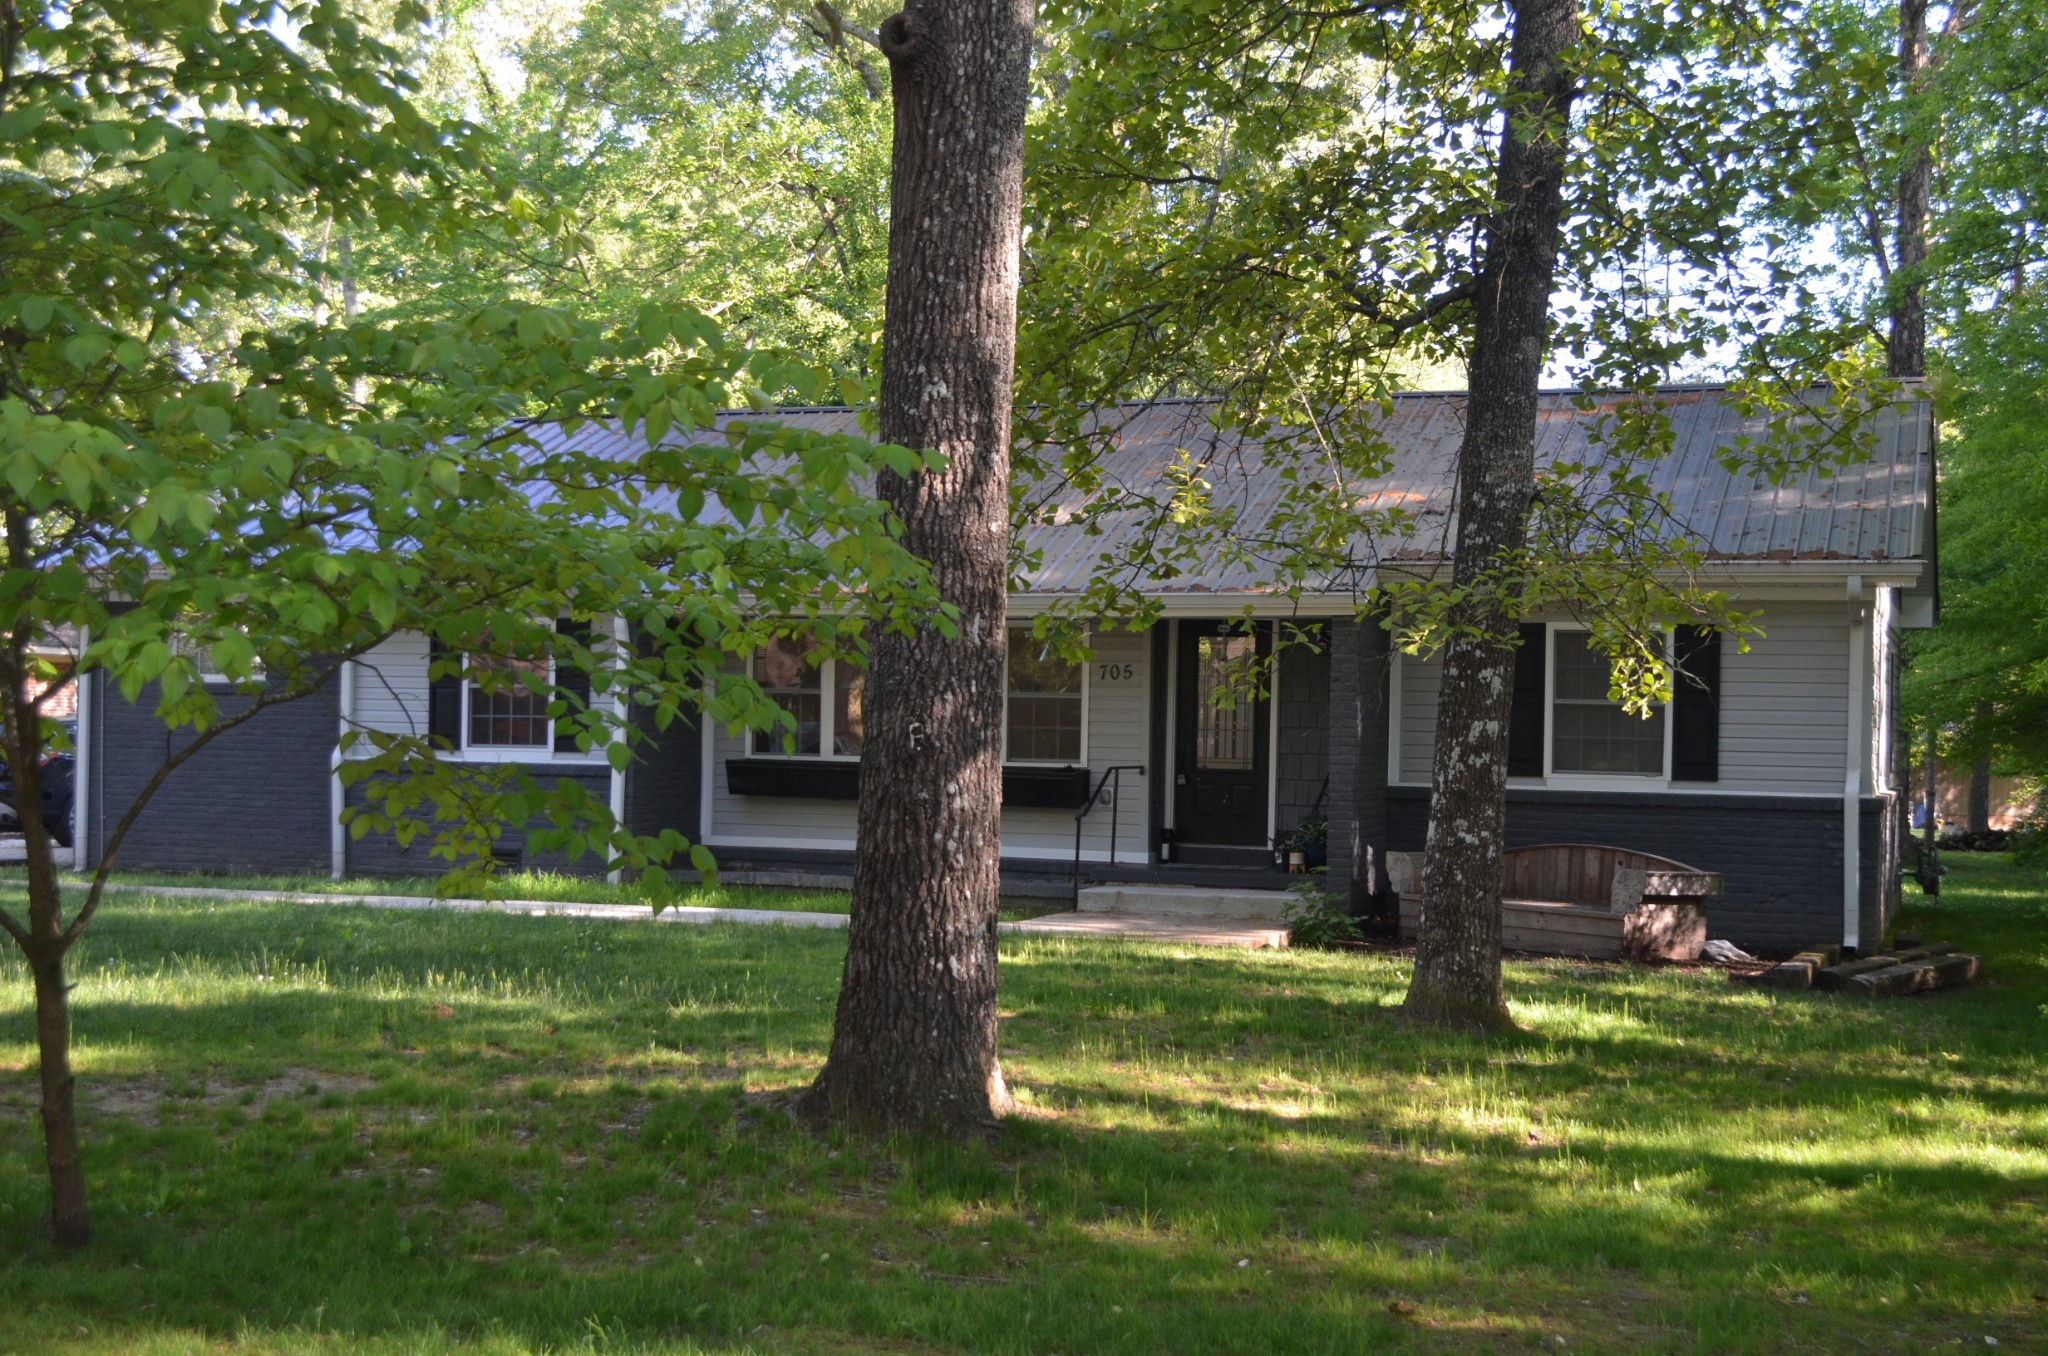 705 BRAGG CIR Property Photo - Tullahoma, TN real estate listing